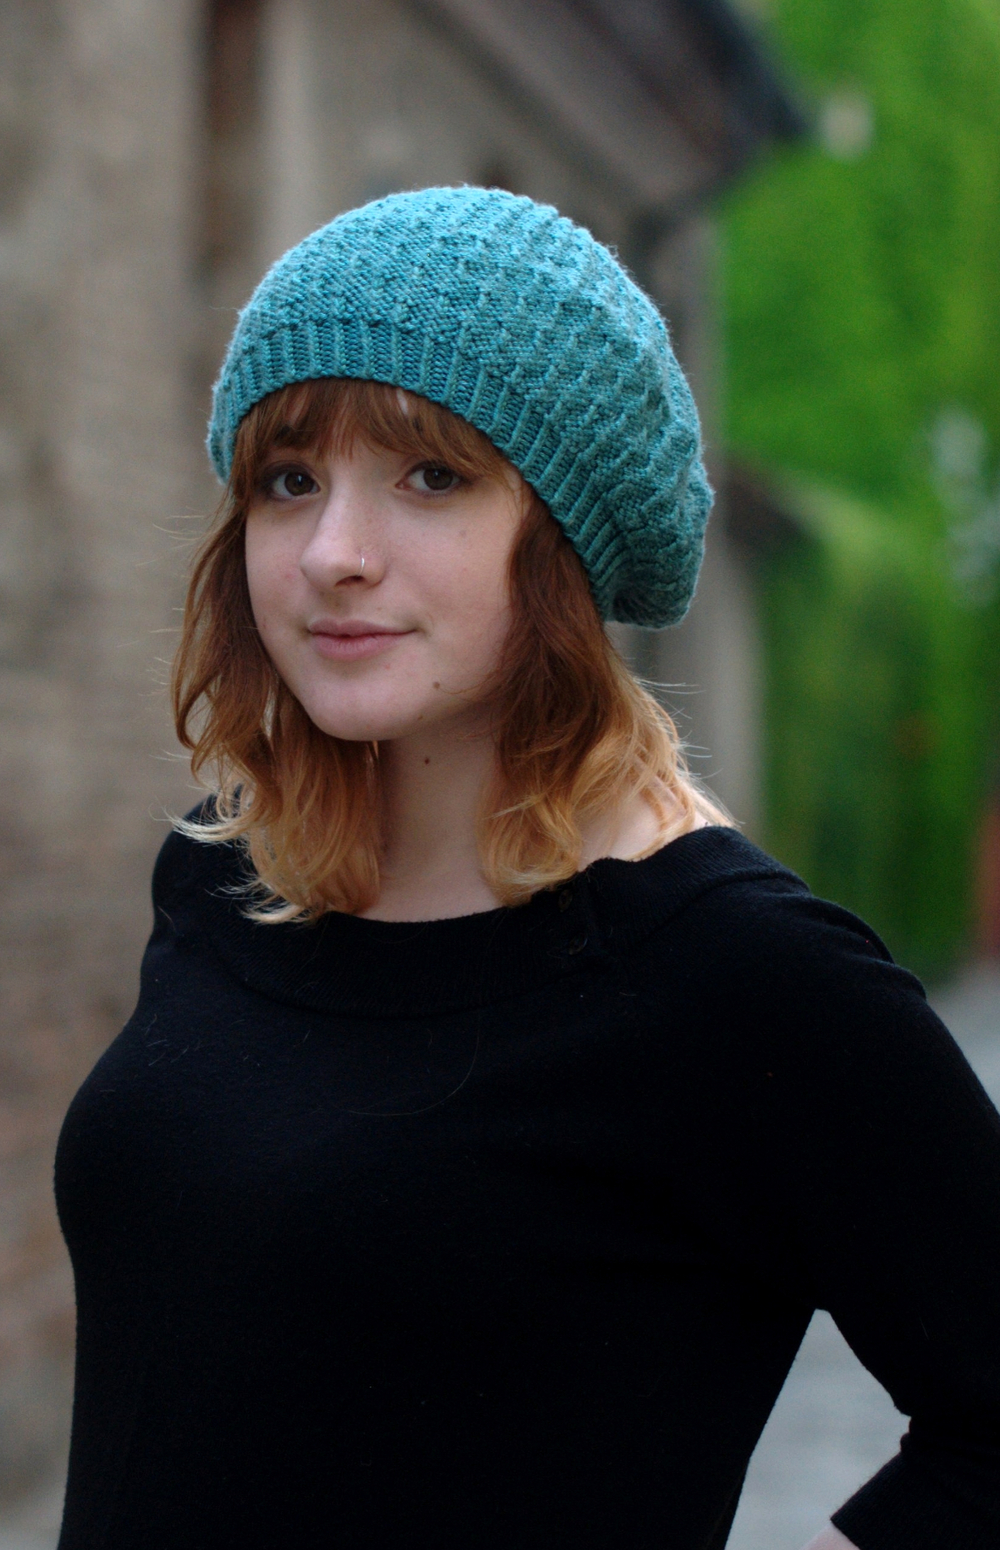 Annular textured beret knitting pattern